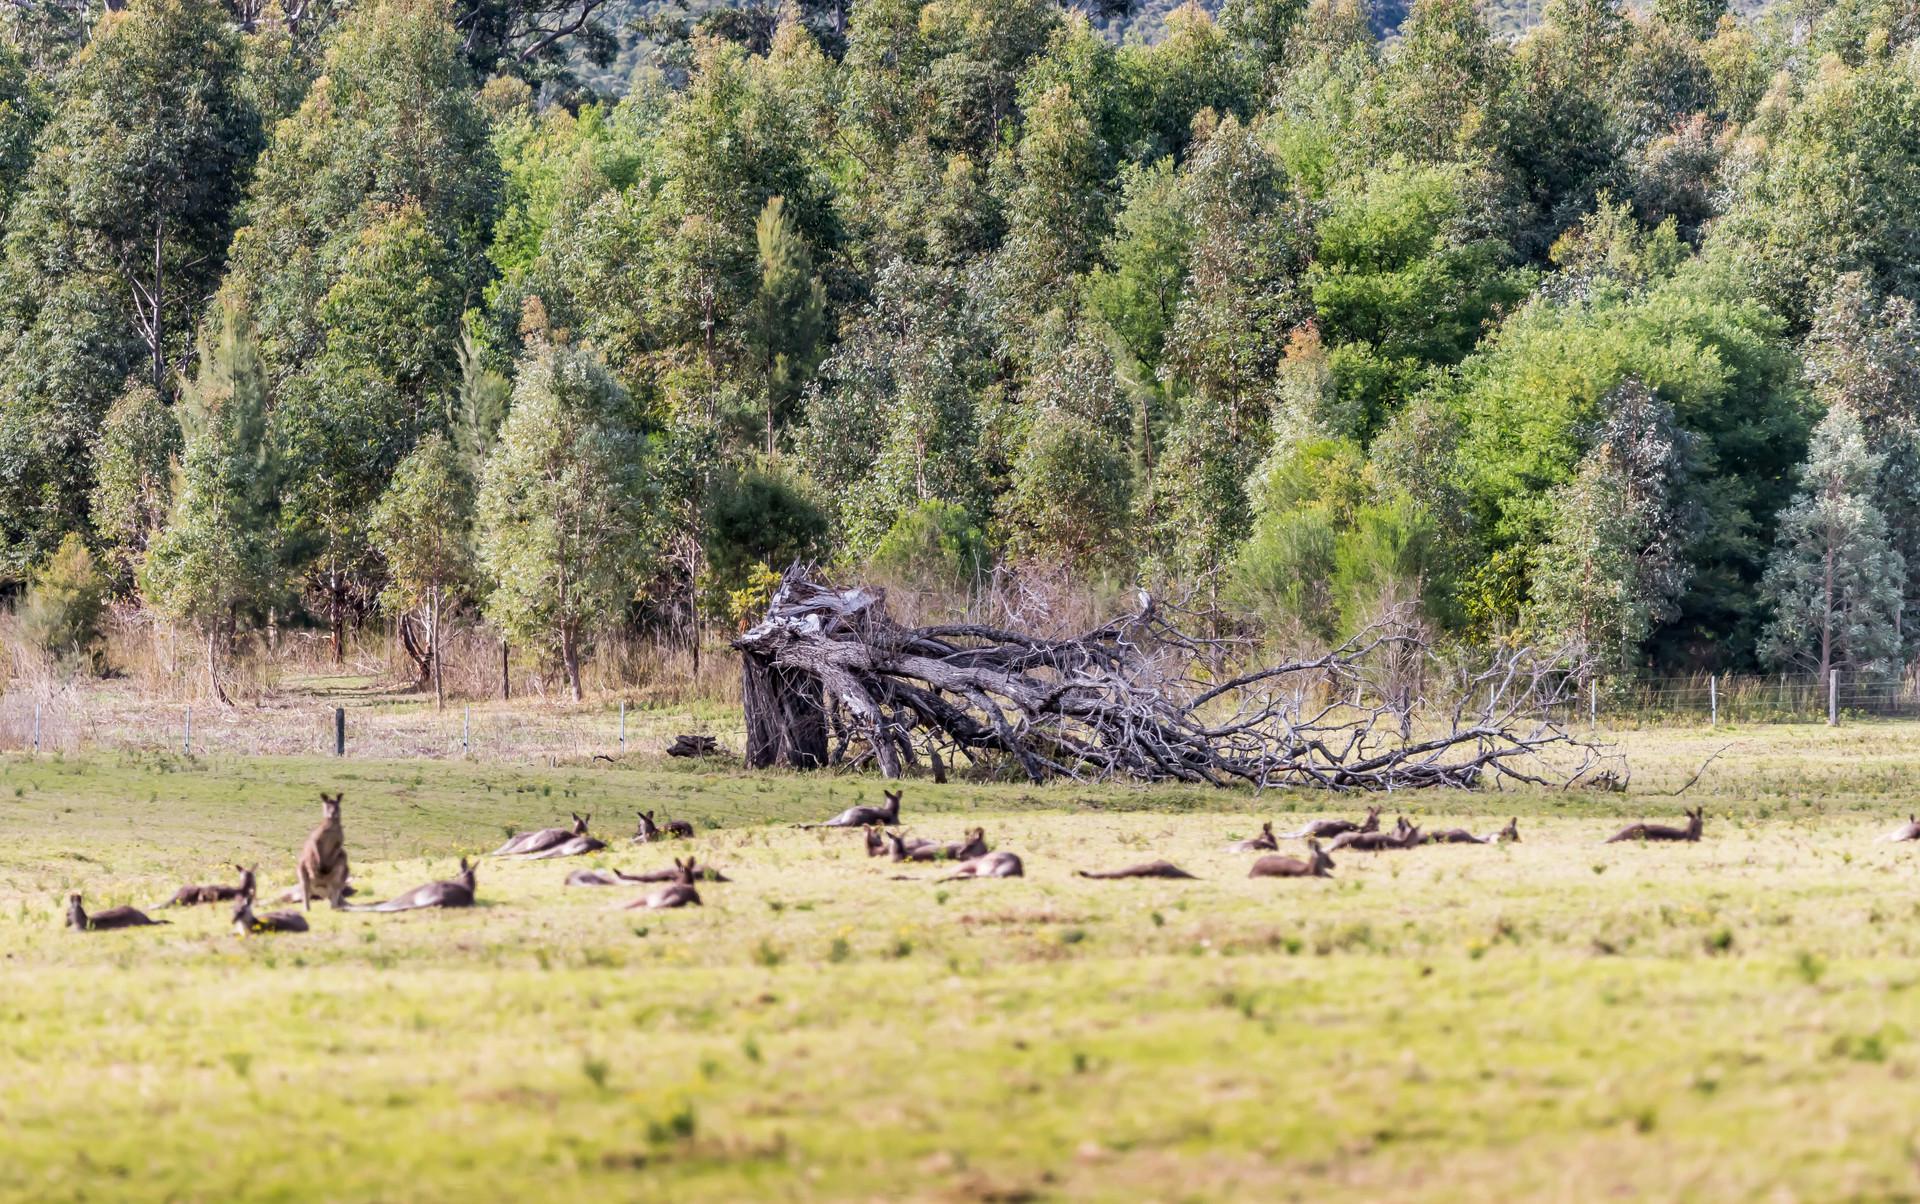 Kangaroo in landscape